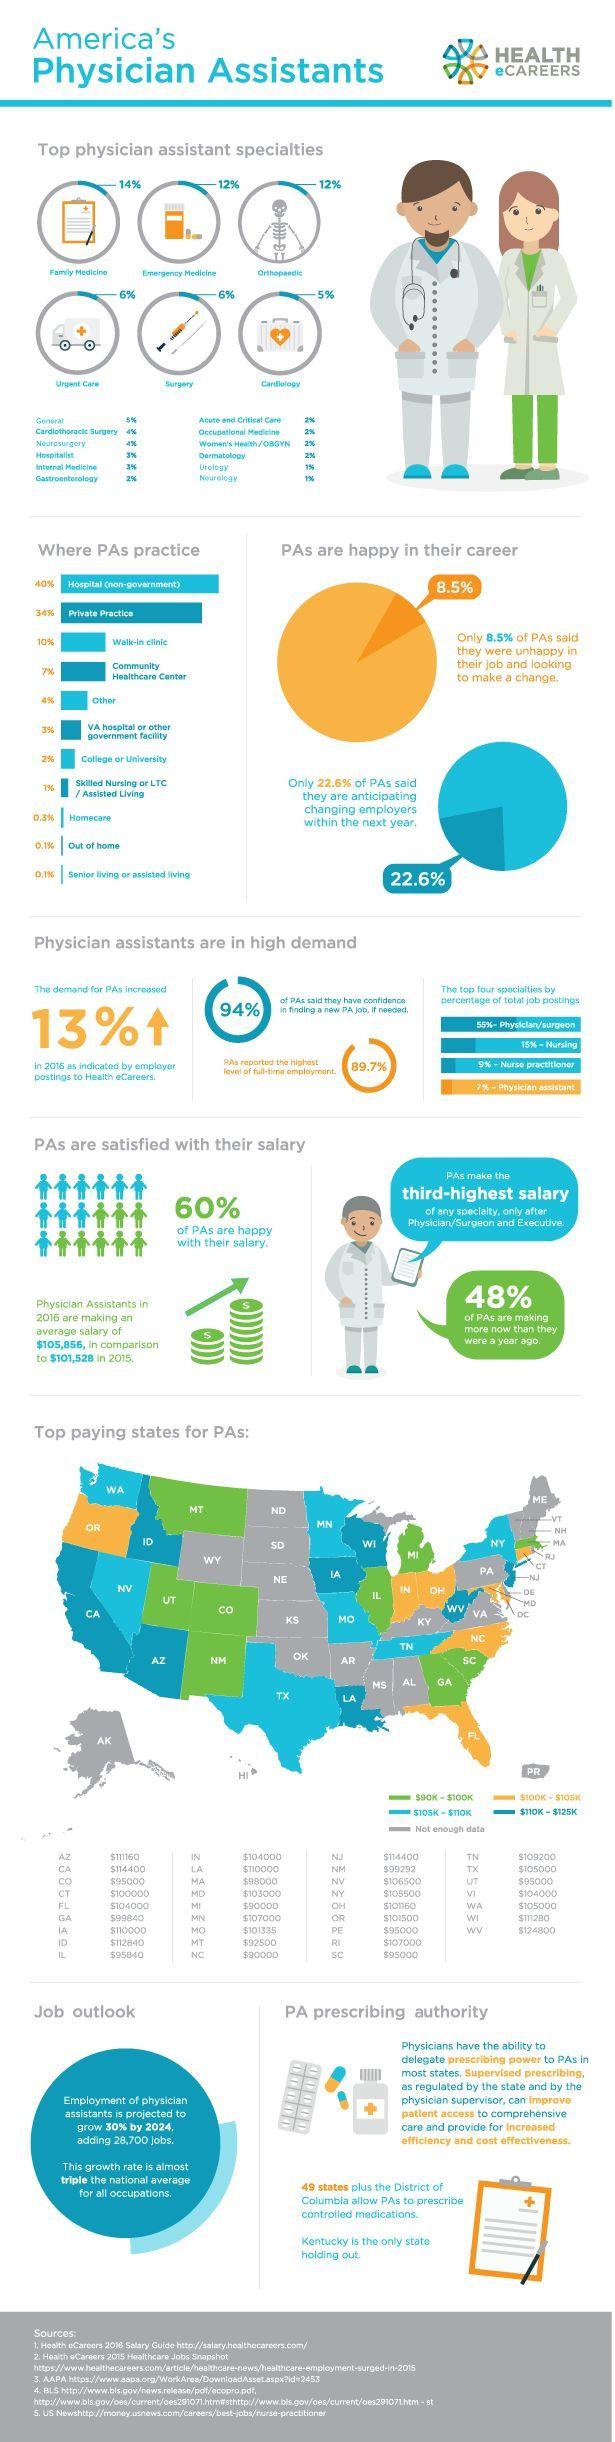 America's Physician Assistants | Health eCareers